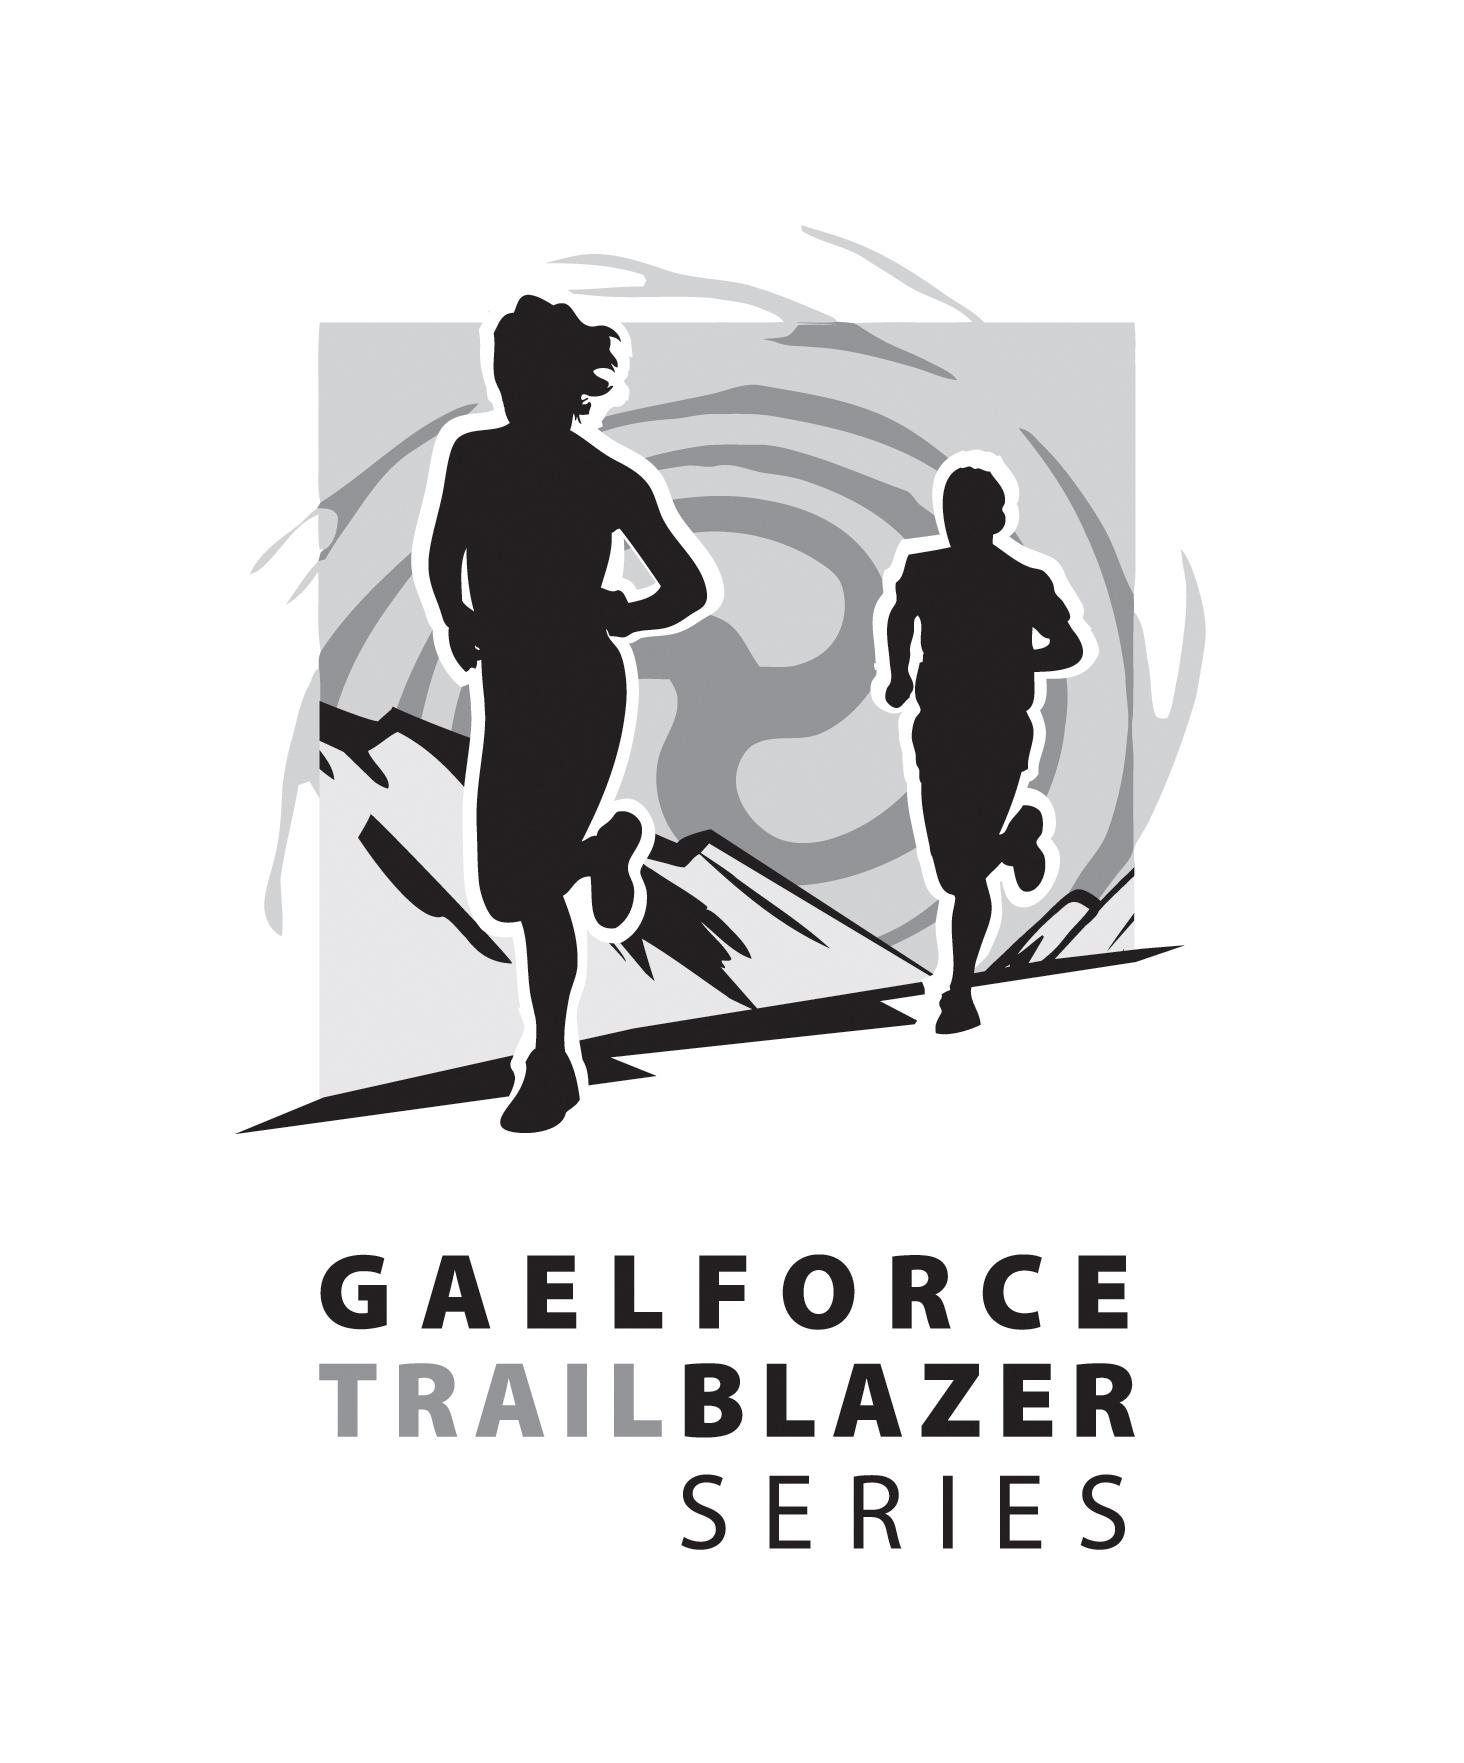 Trail Blazer Series 15km trail run